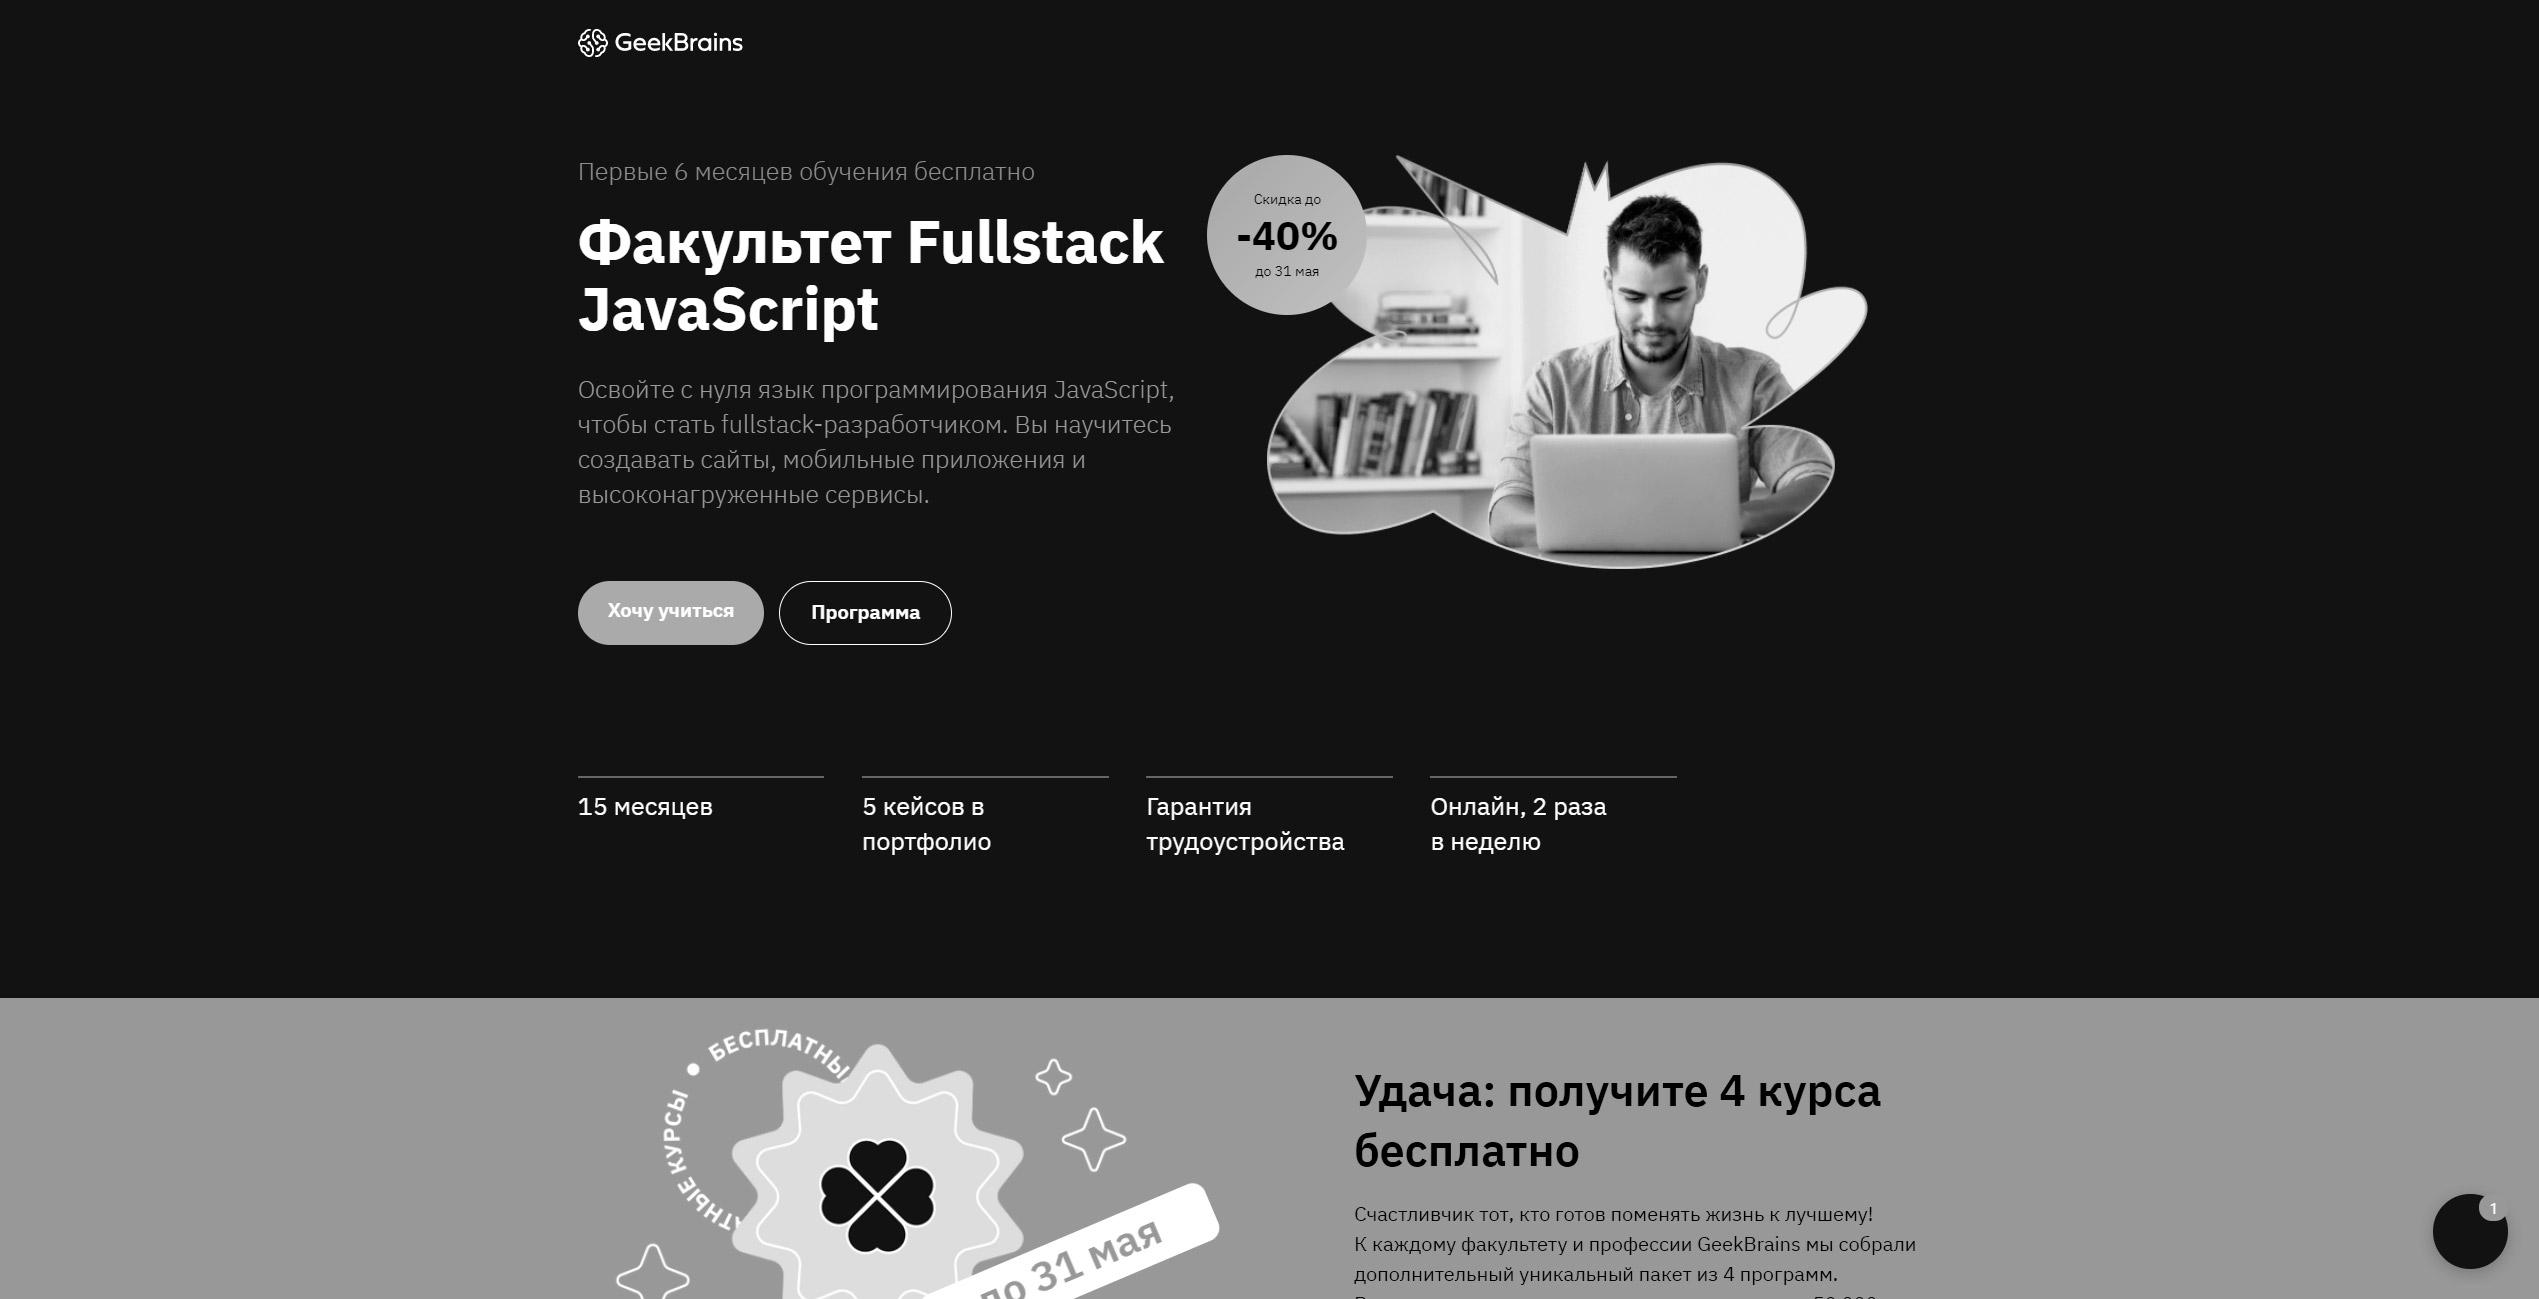 Факультет Fullstack JavaScript от GeekBrains